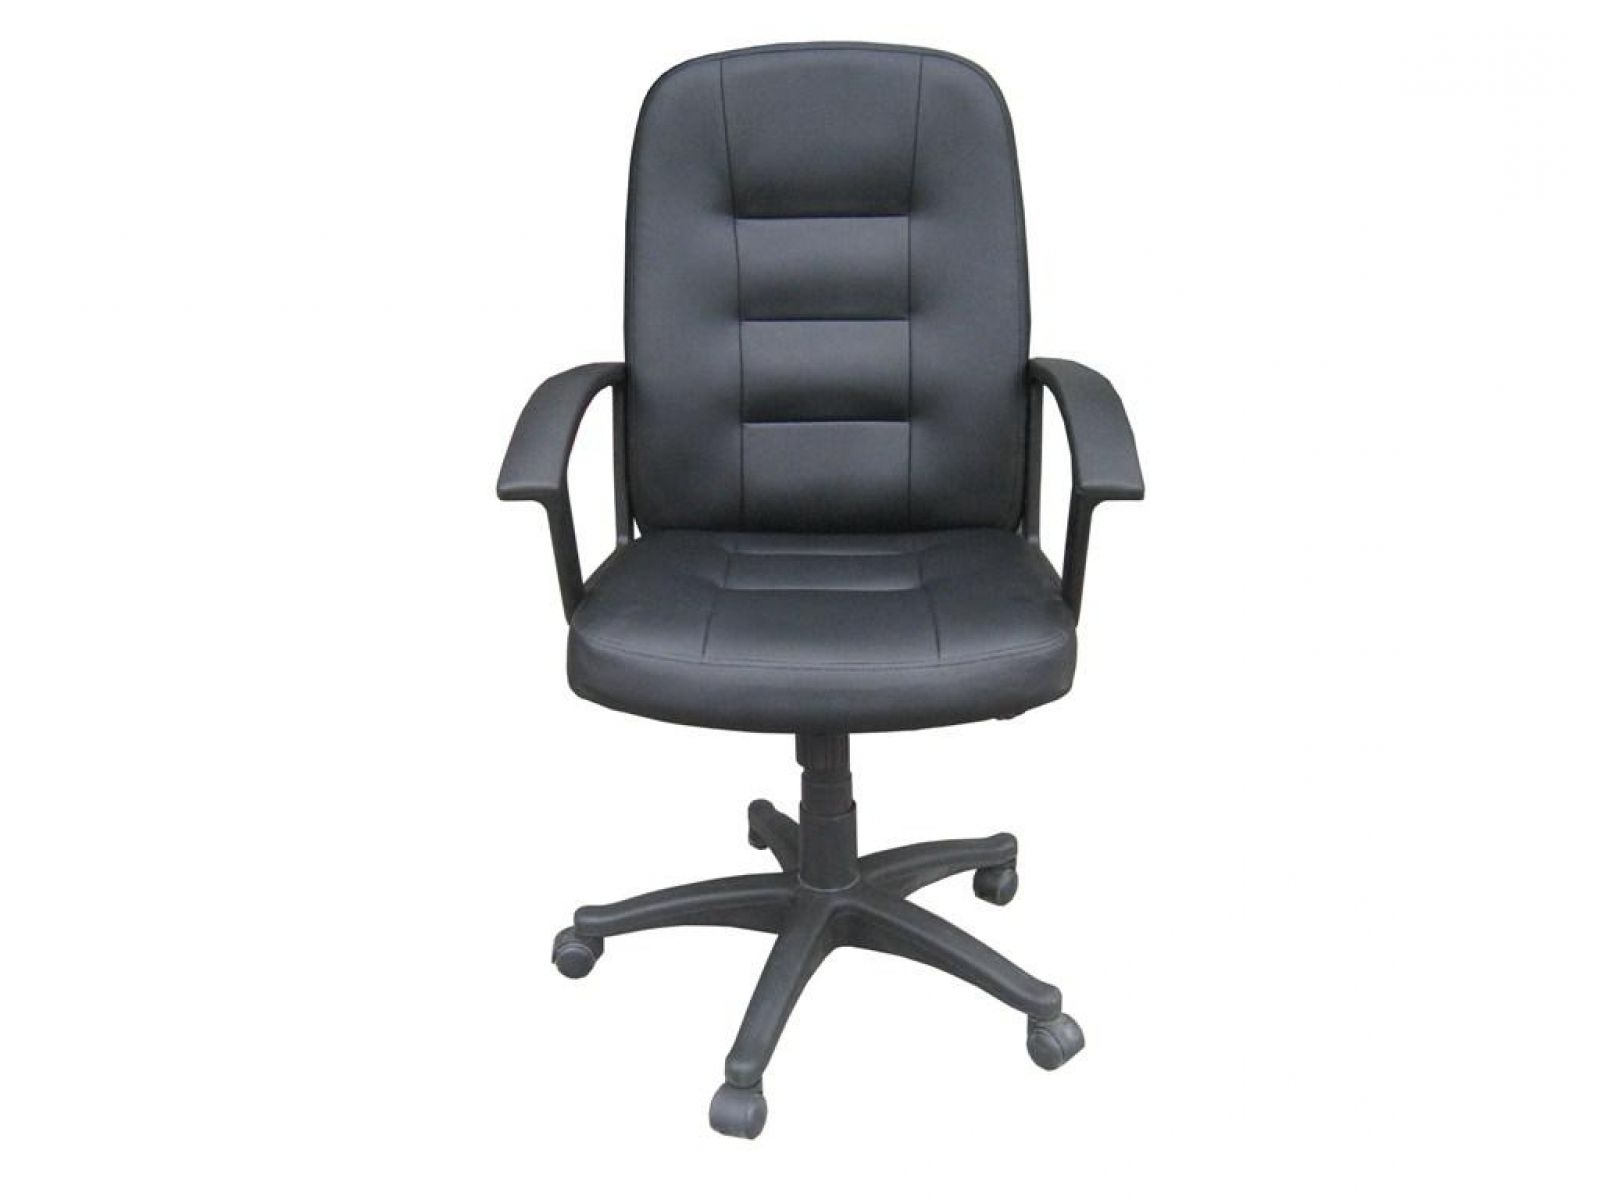 Billige Büromöbel | Stroyreestr